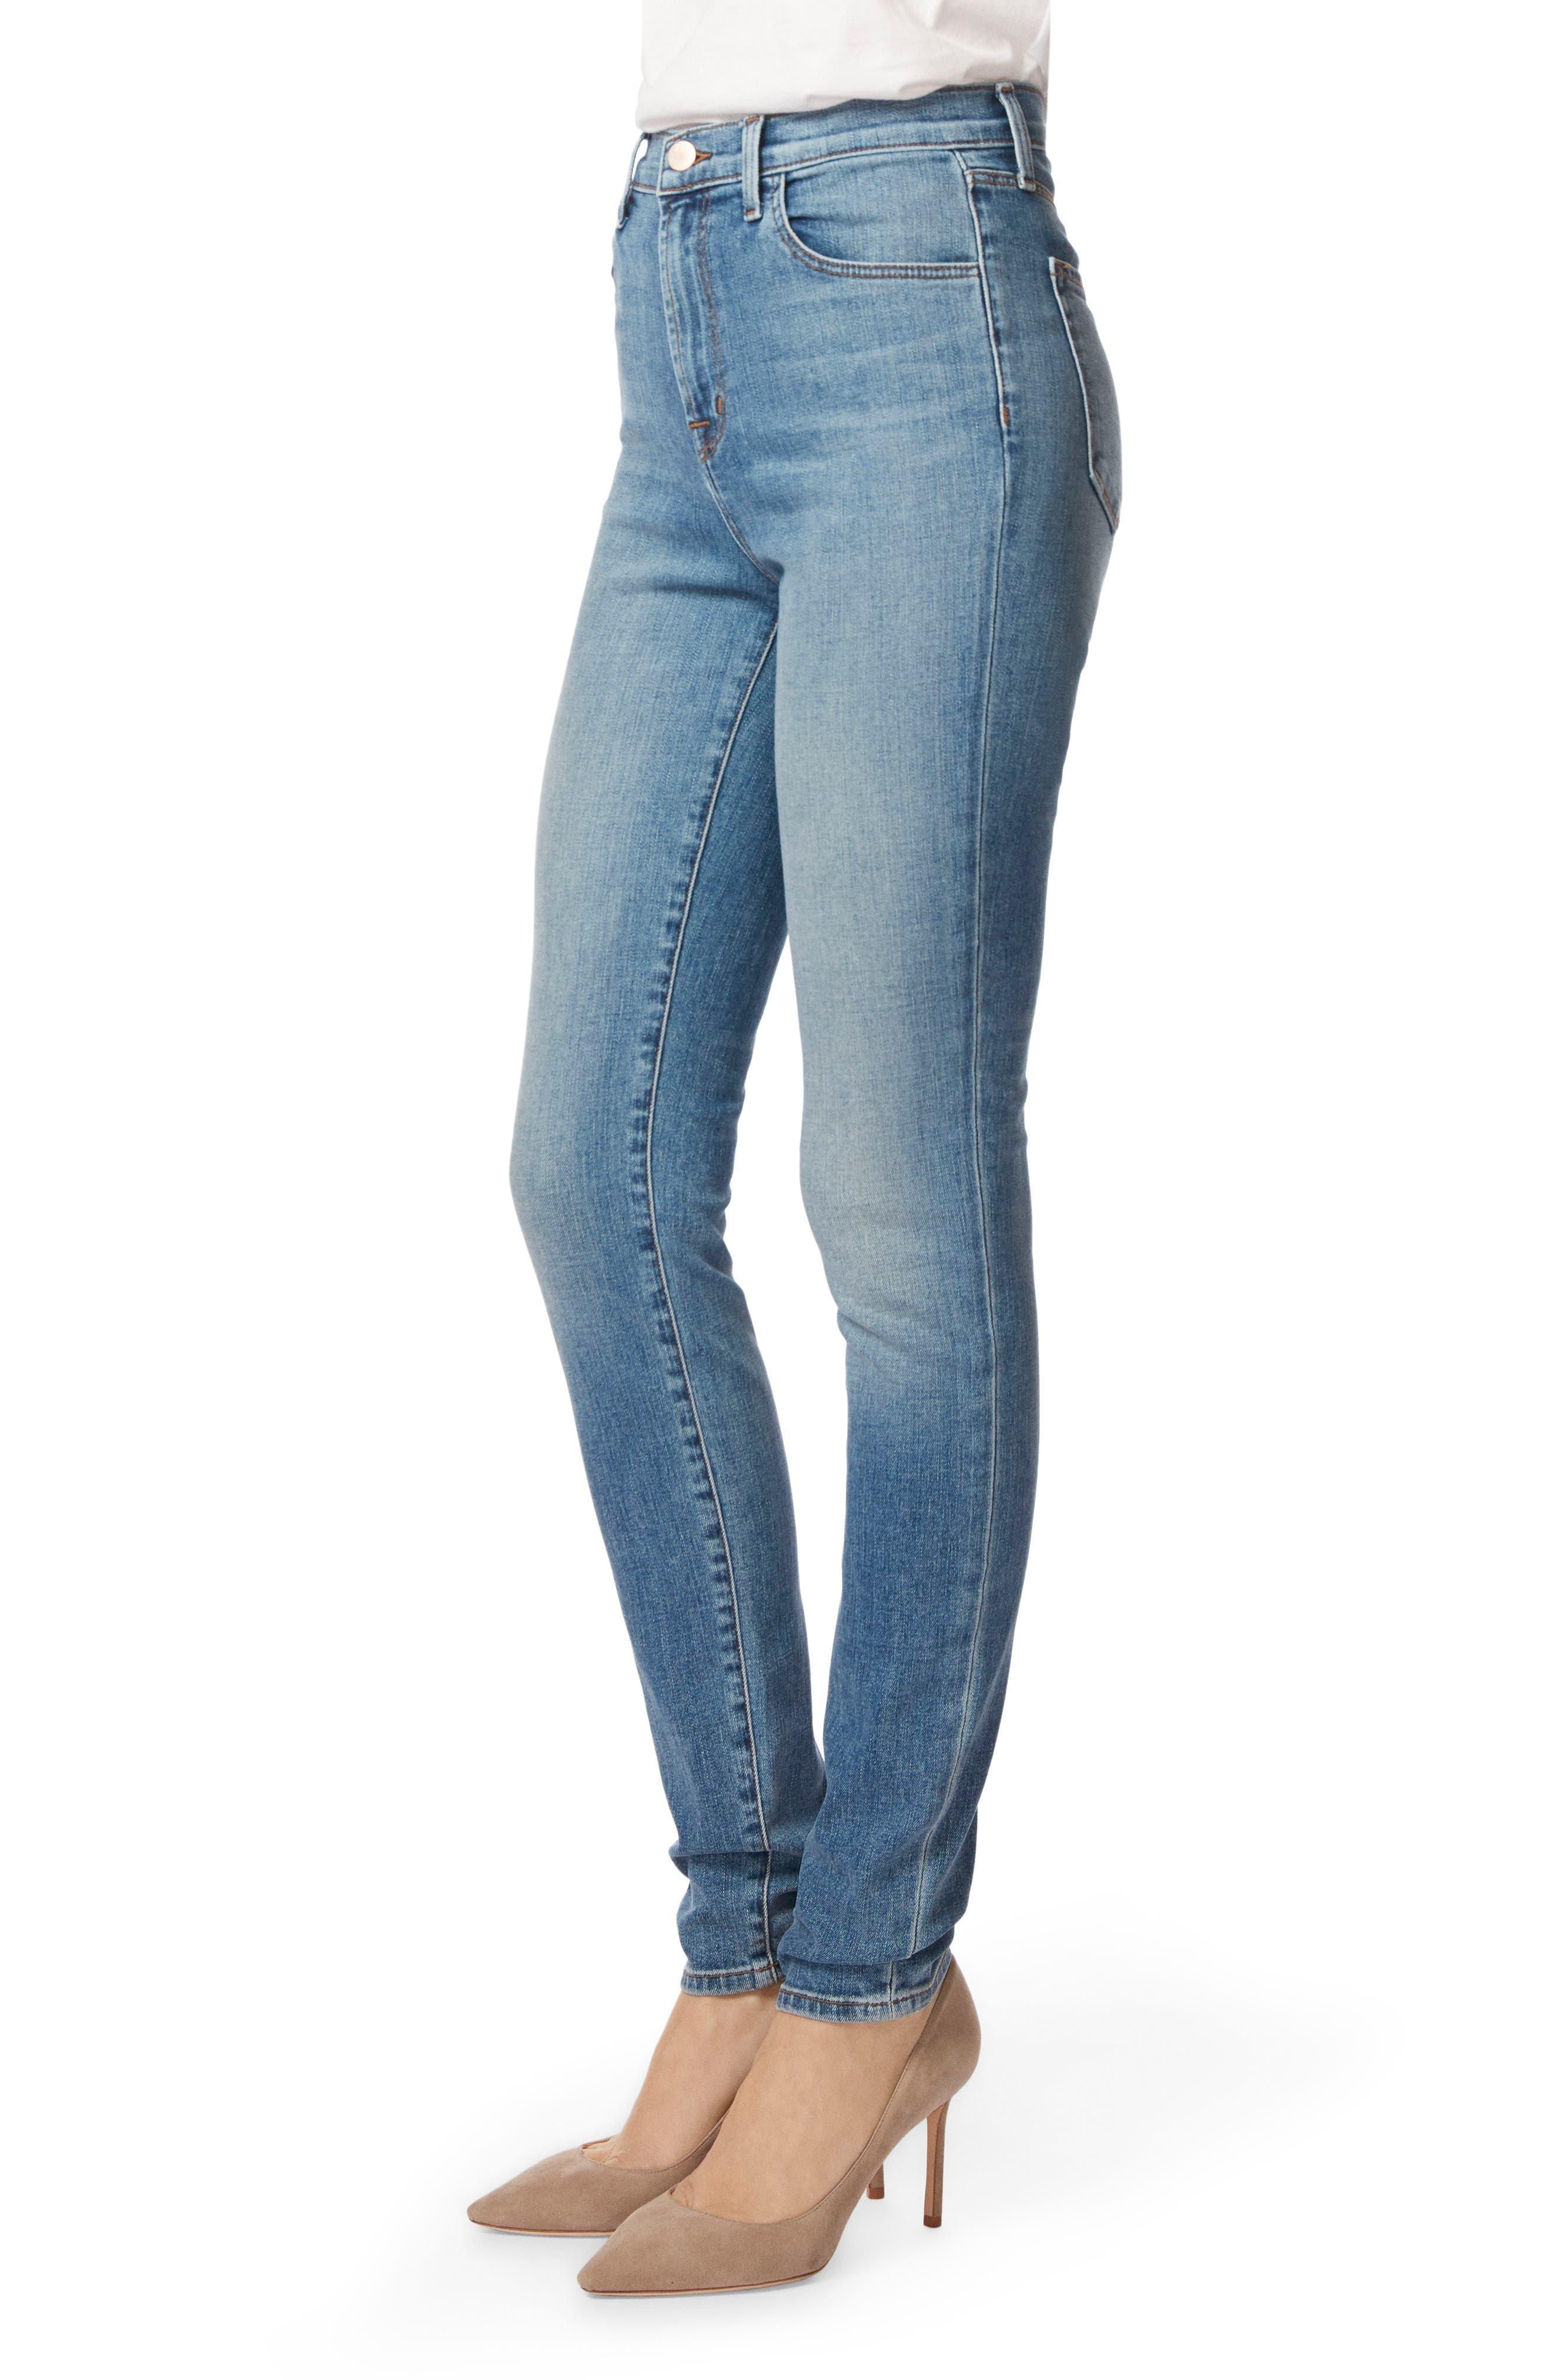 Carolina Super High Waist Skinny Jeans,                             Alternate thumbnail 3, color,                             400